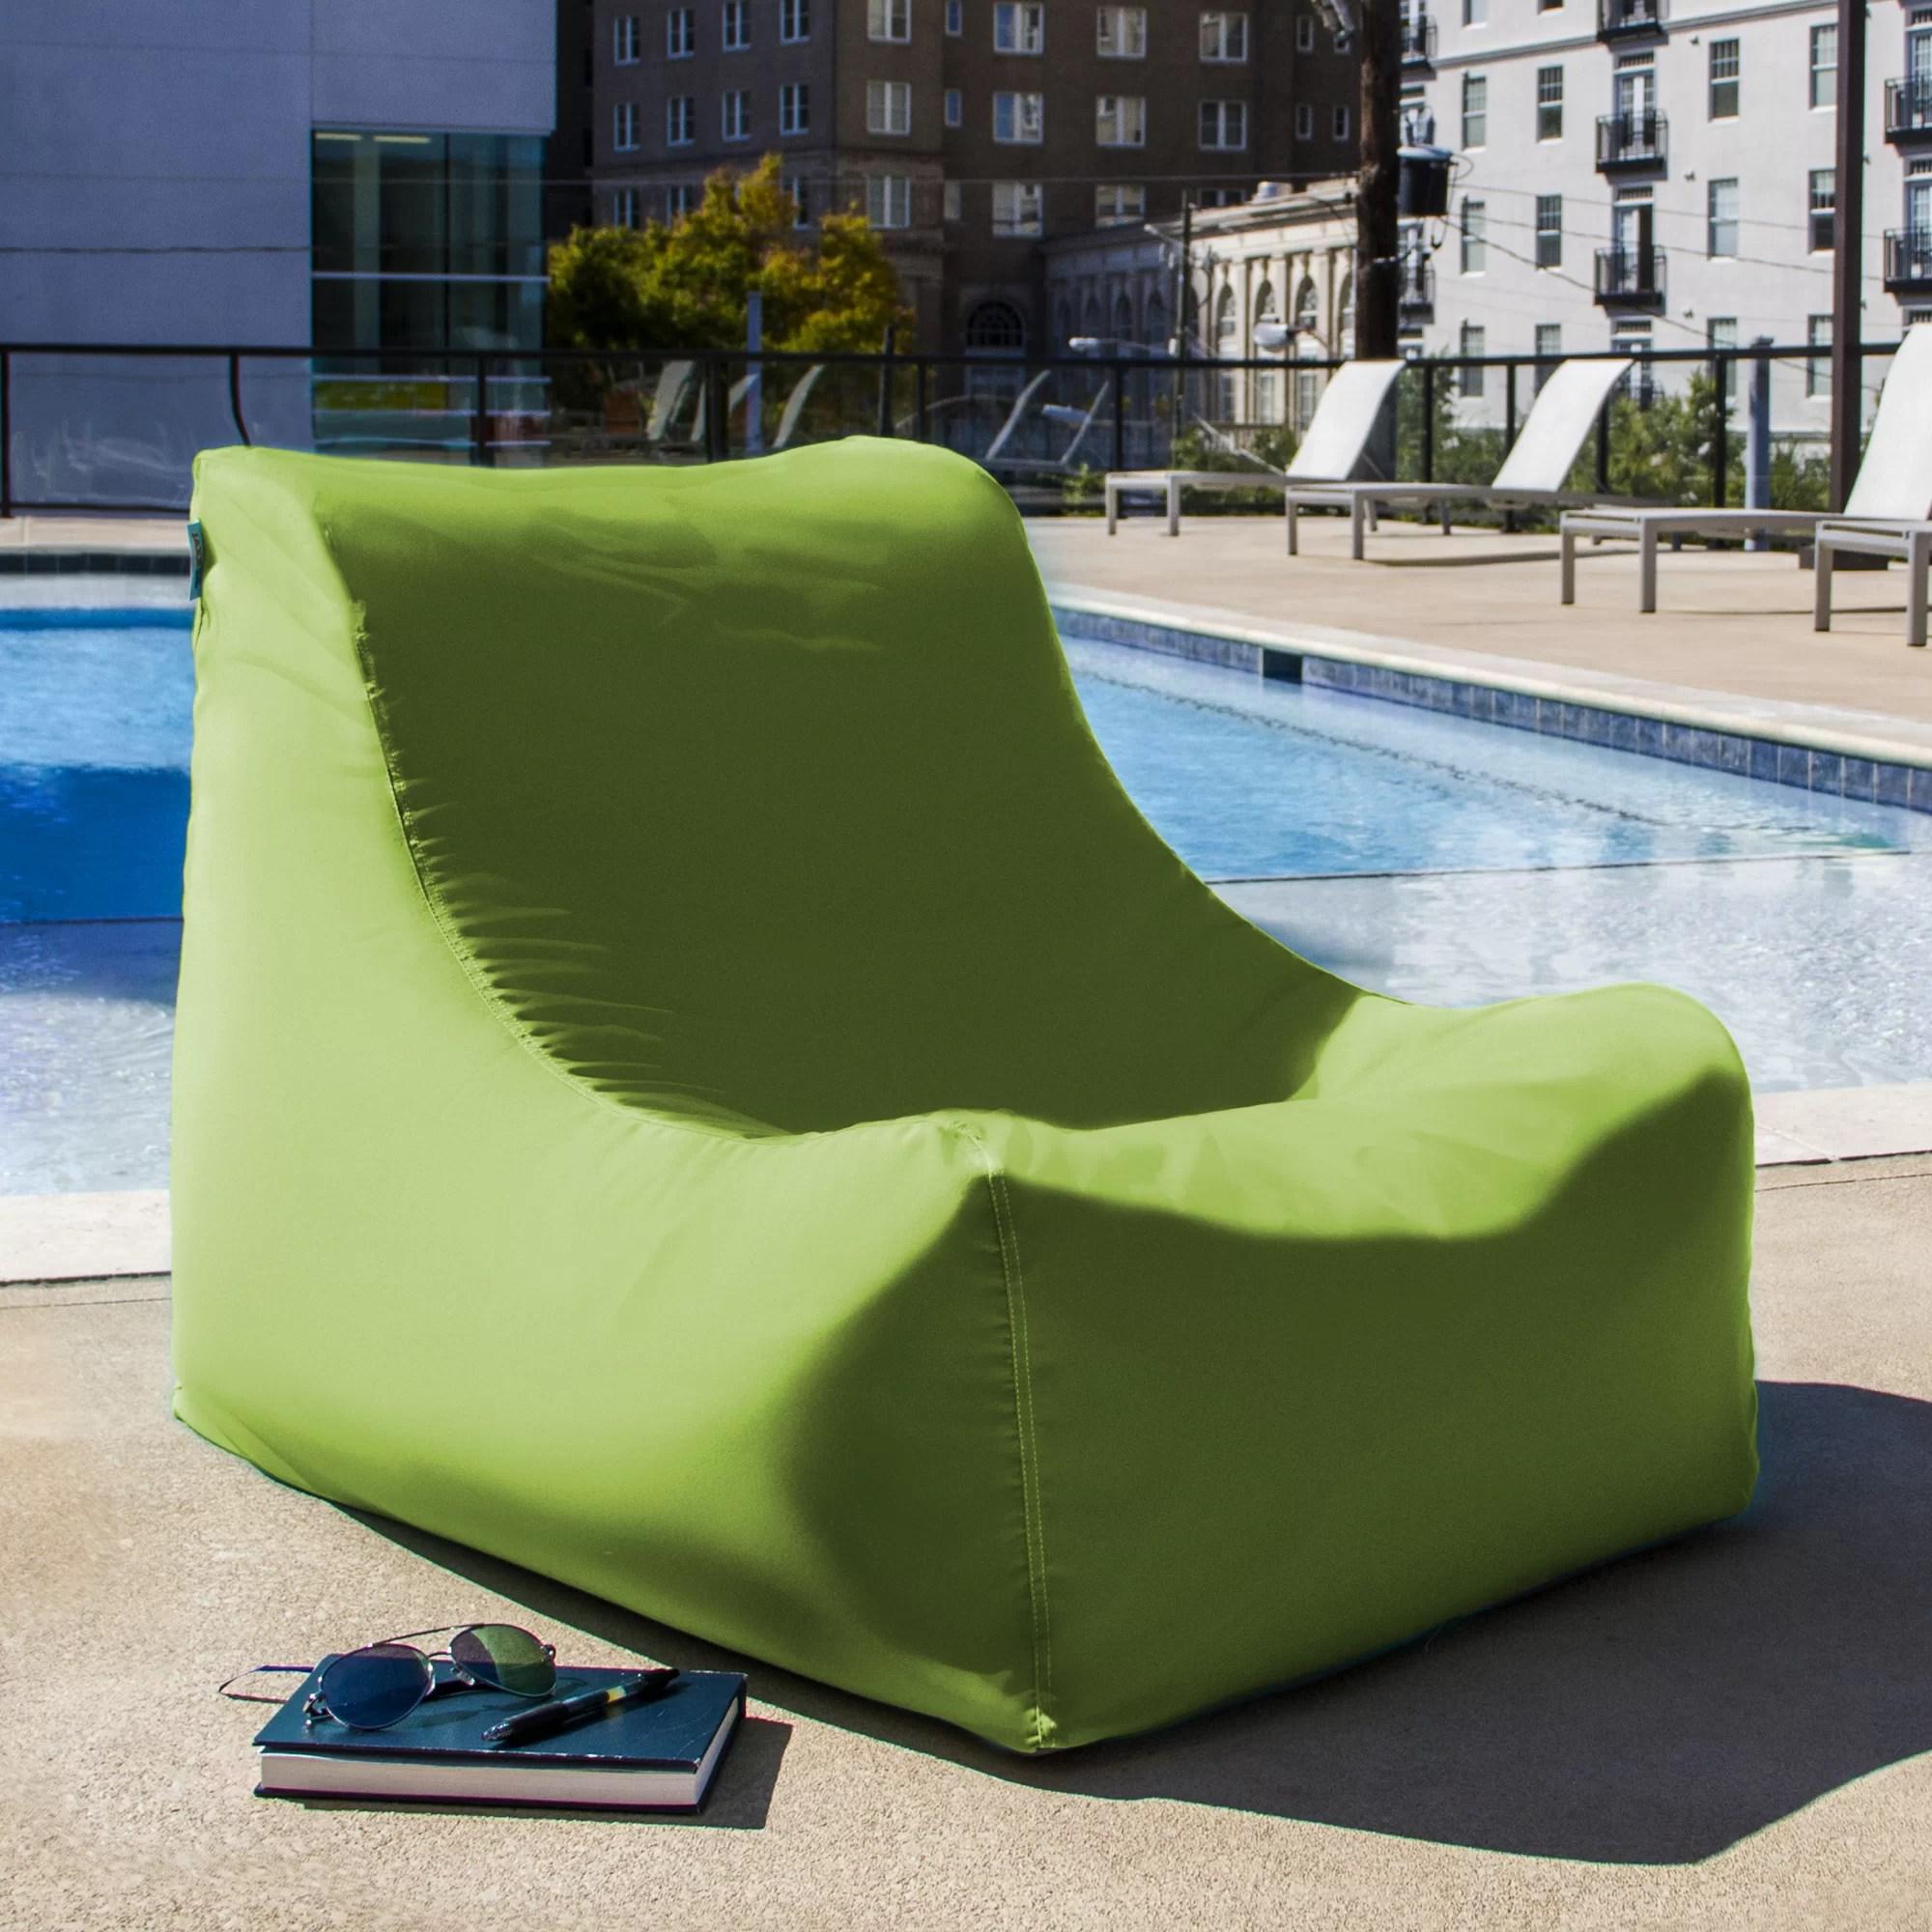 custom bean bag chairs canada chair covers in kampala jaxx ponce outdoor patio lounge and reviews wayfair